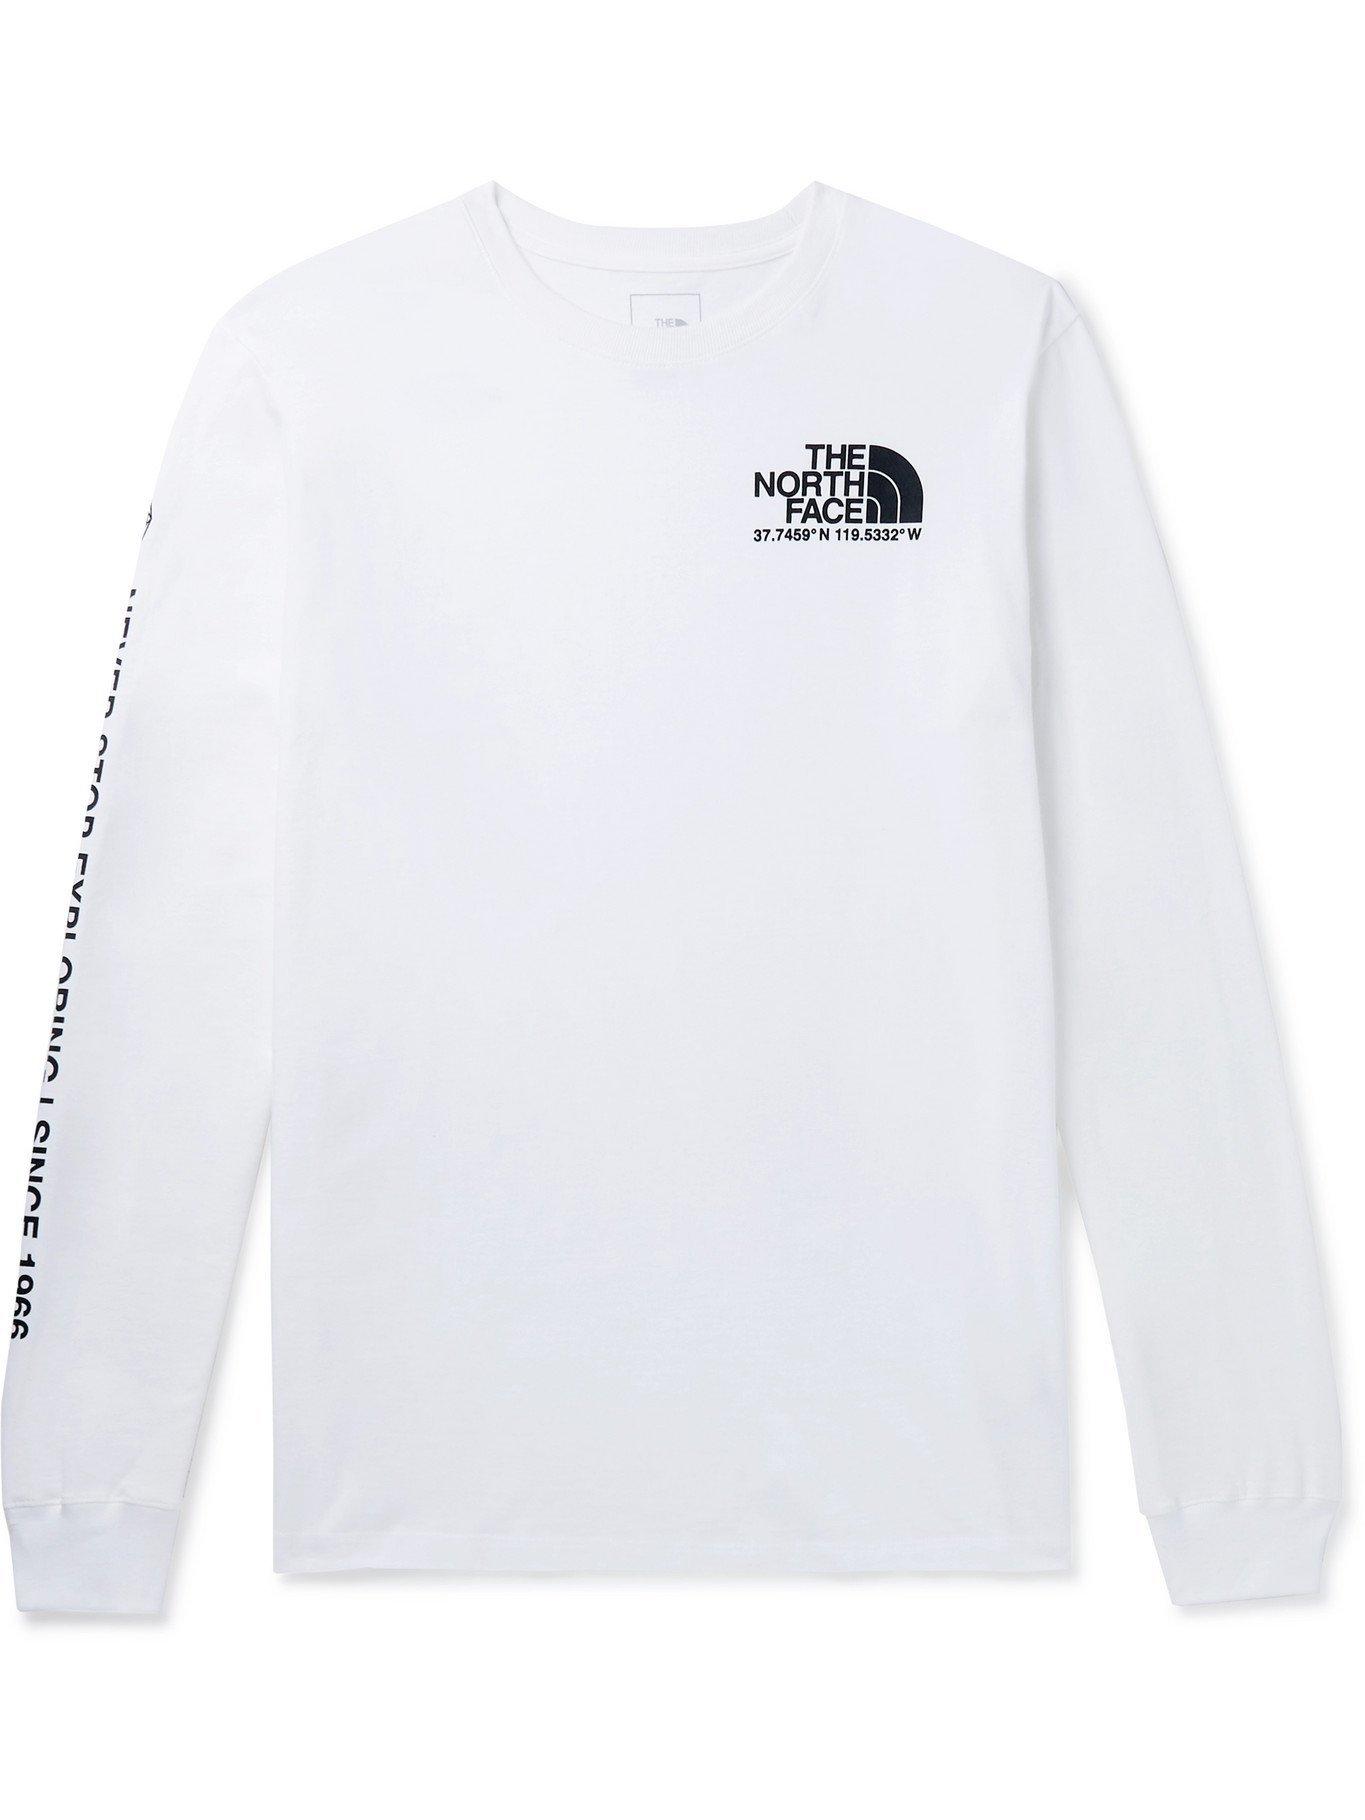 Photo: THE NORTH FACE - Logo-Print Cotton-Jersey T-Shirt - White - XL